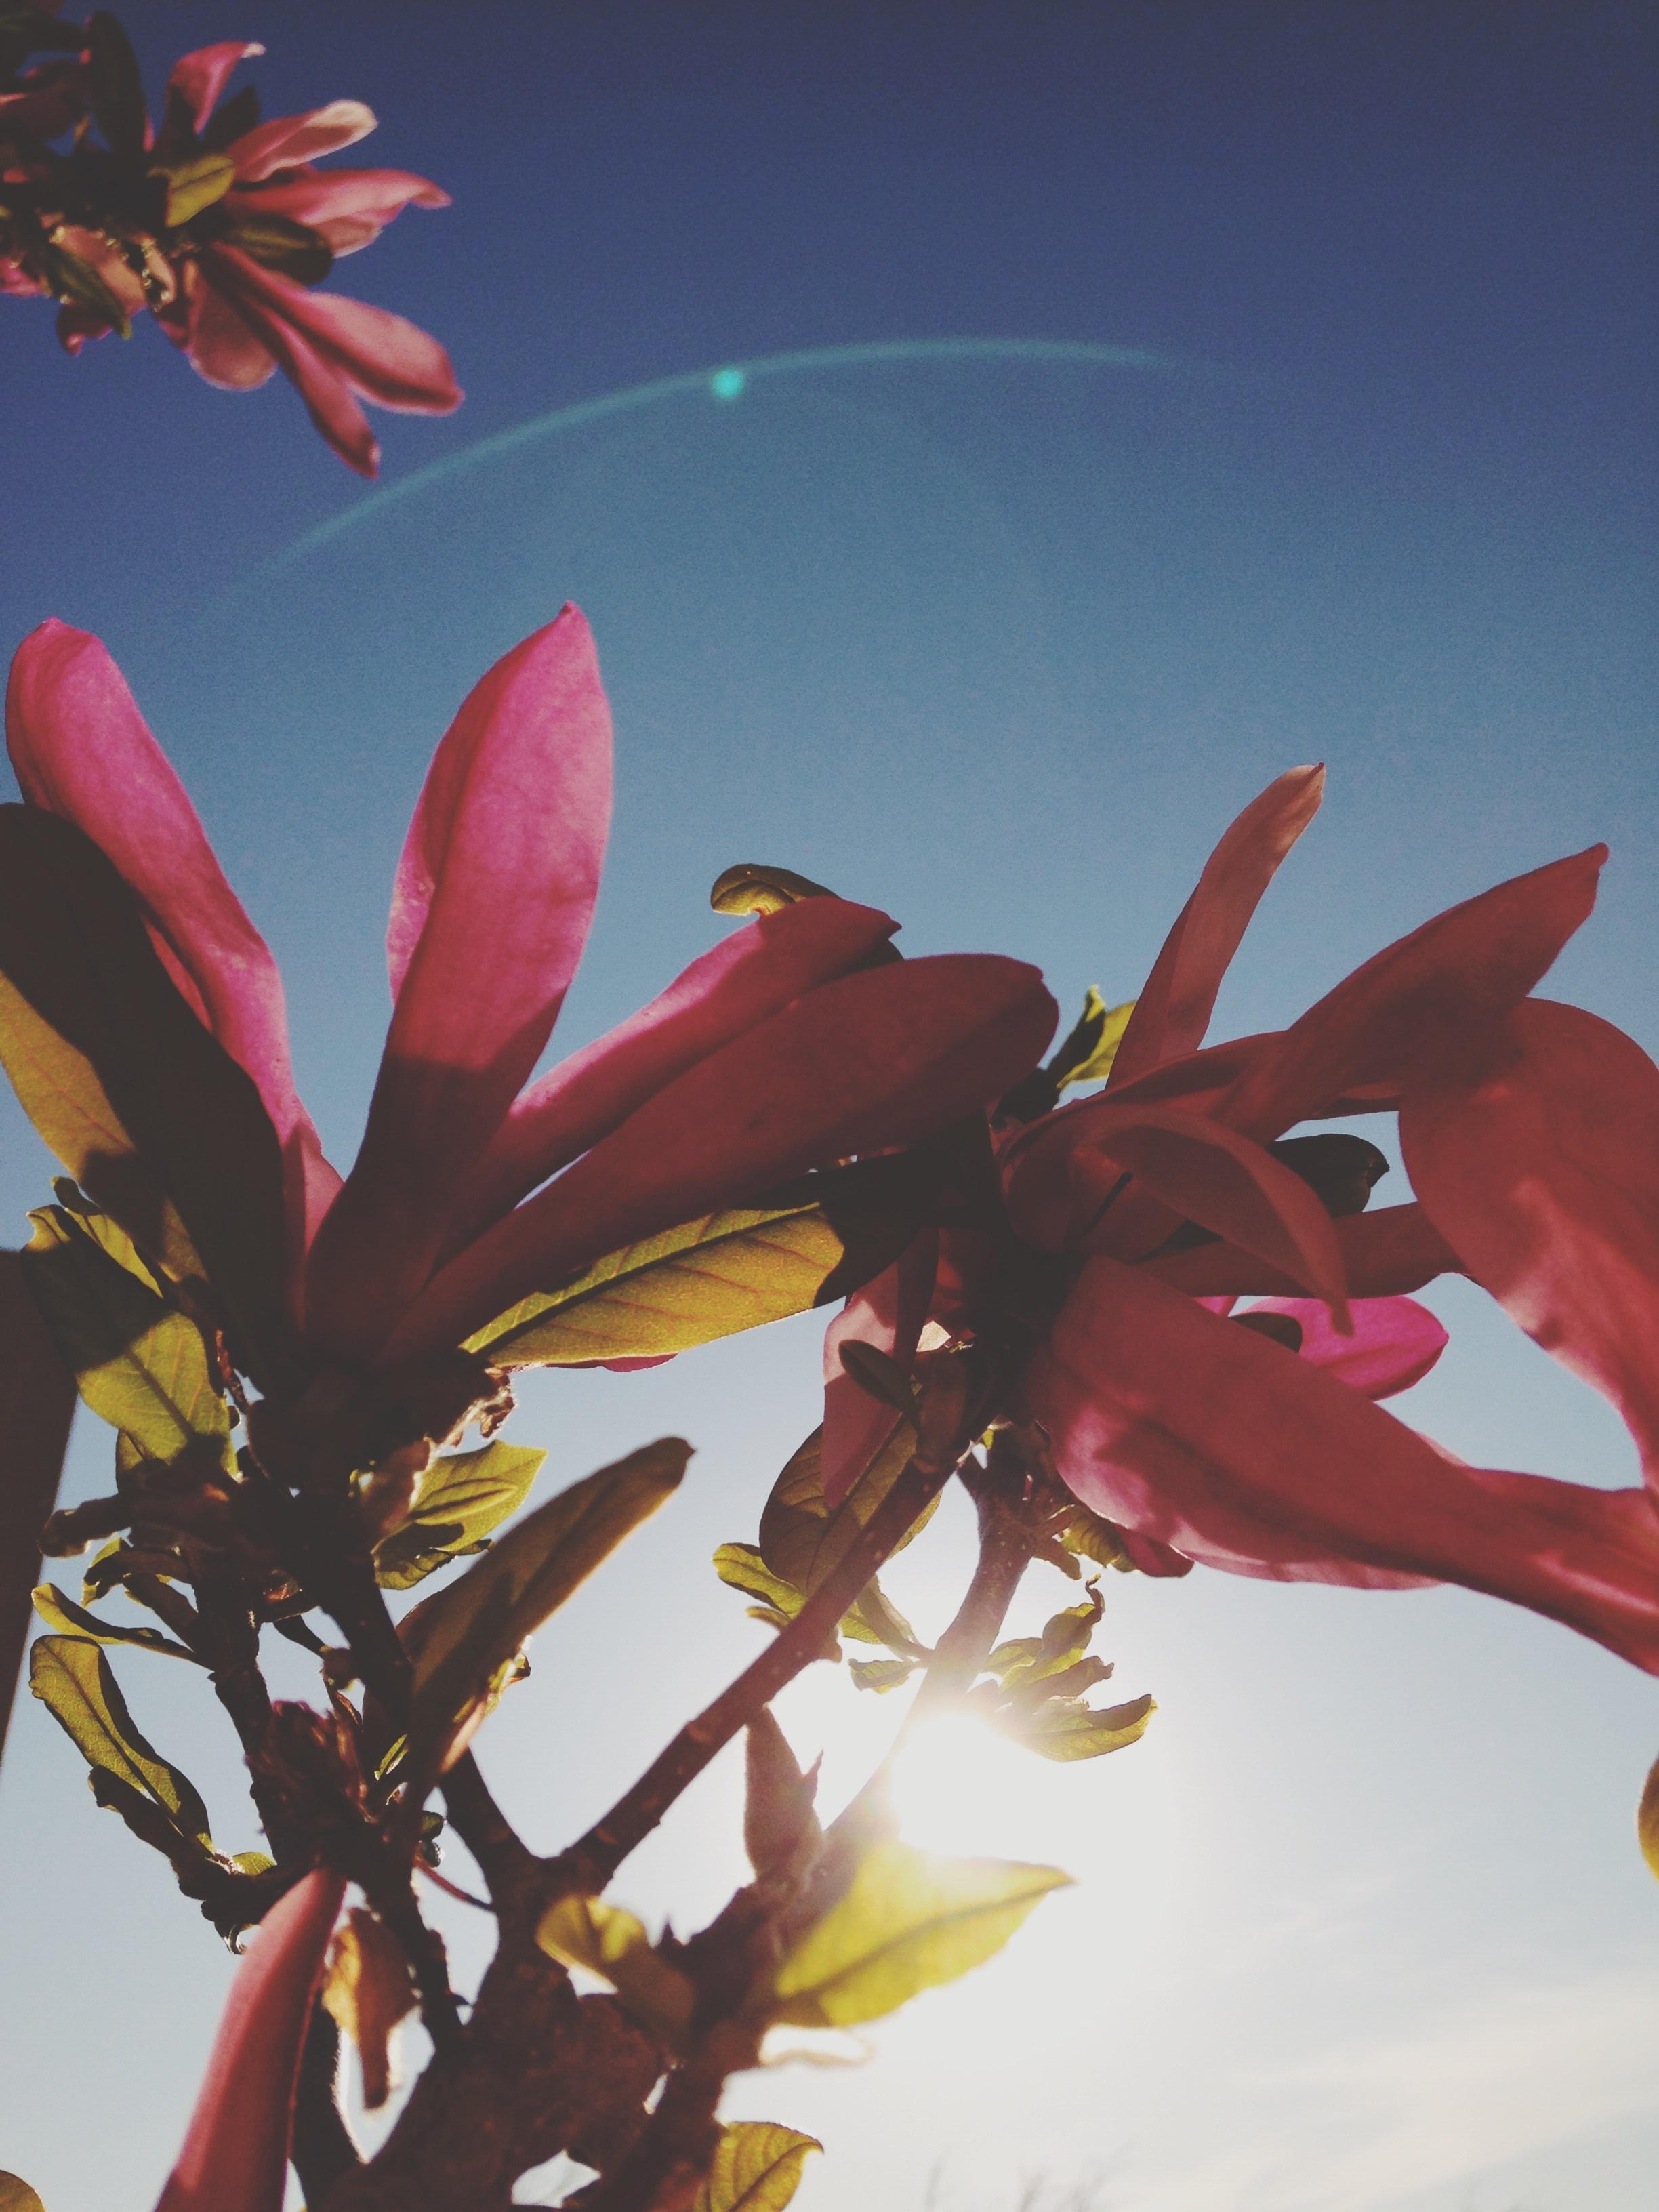 free images tree branch blossom sunlight leaf flower petal